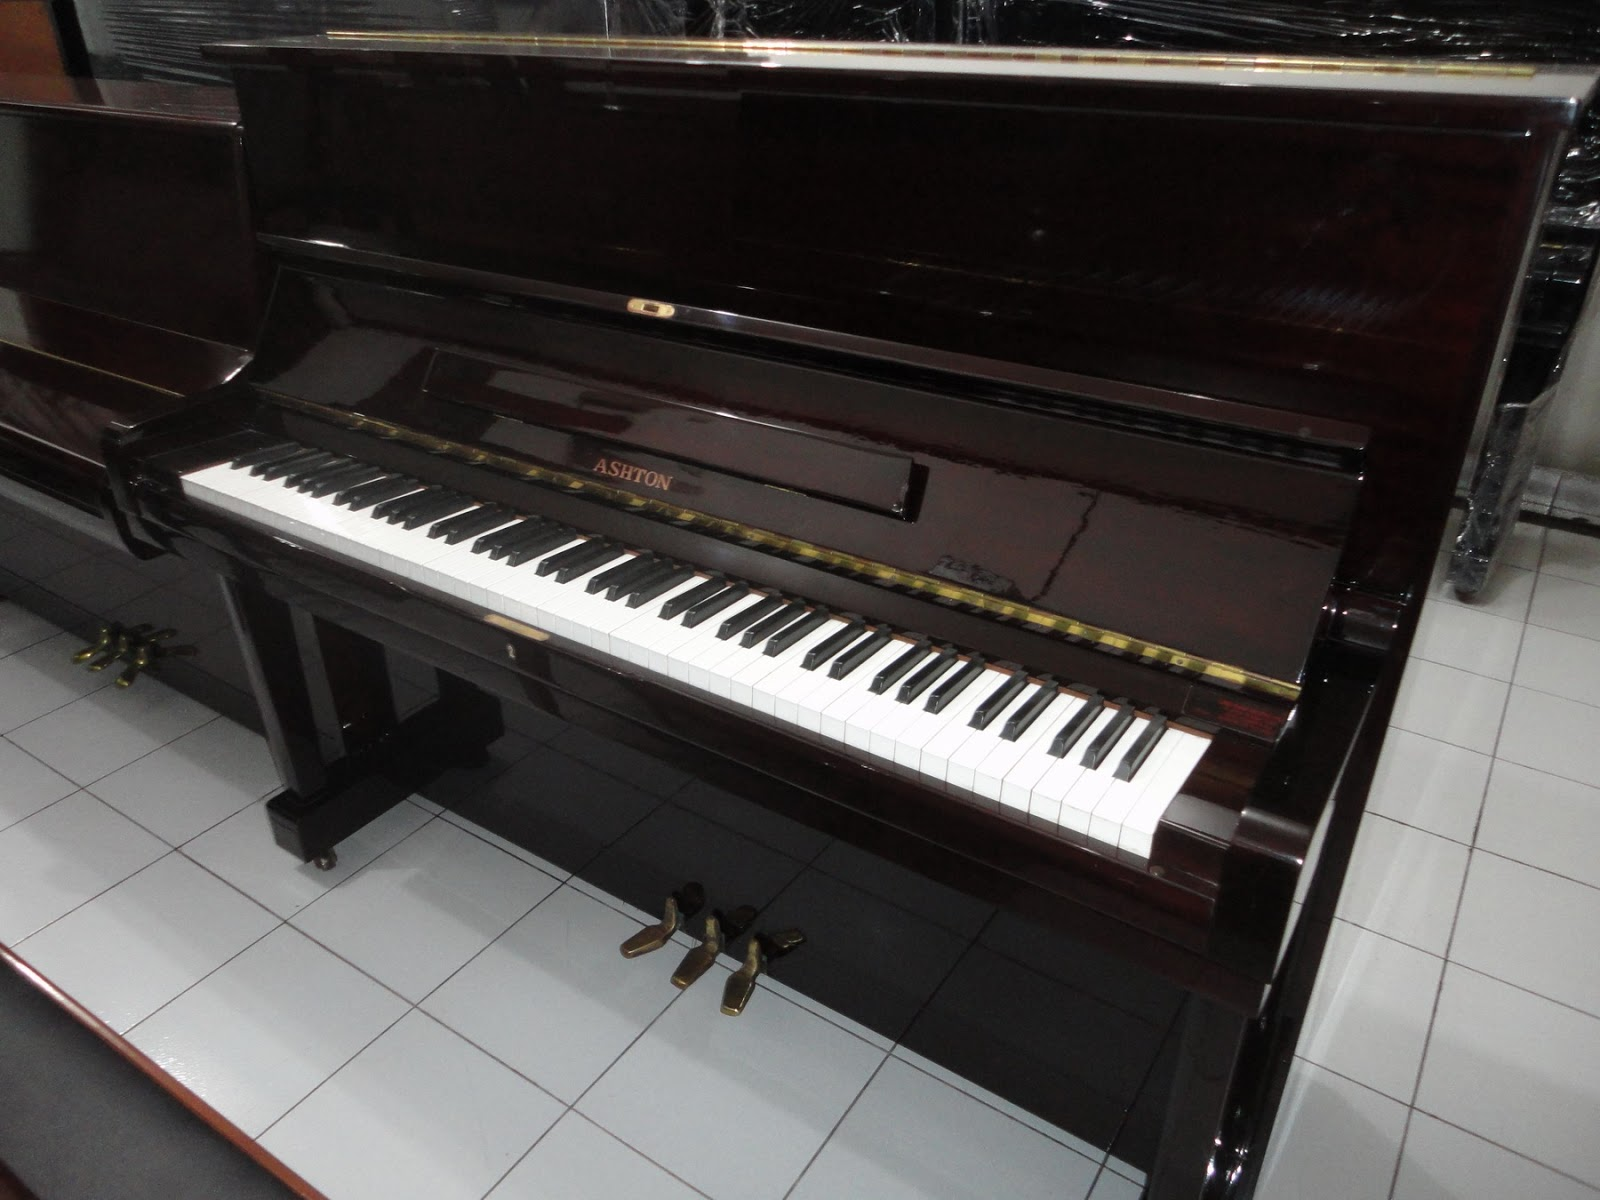 Pin Jual Piano Yamaha Ajilbabcom Portal On Pinterest